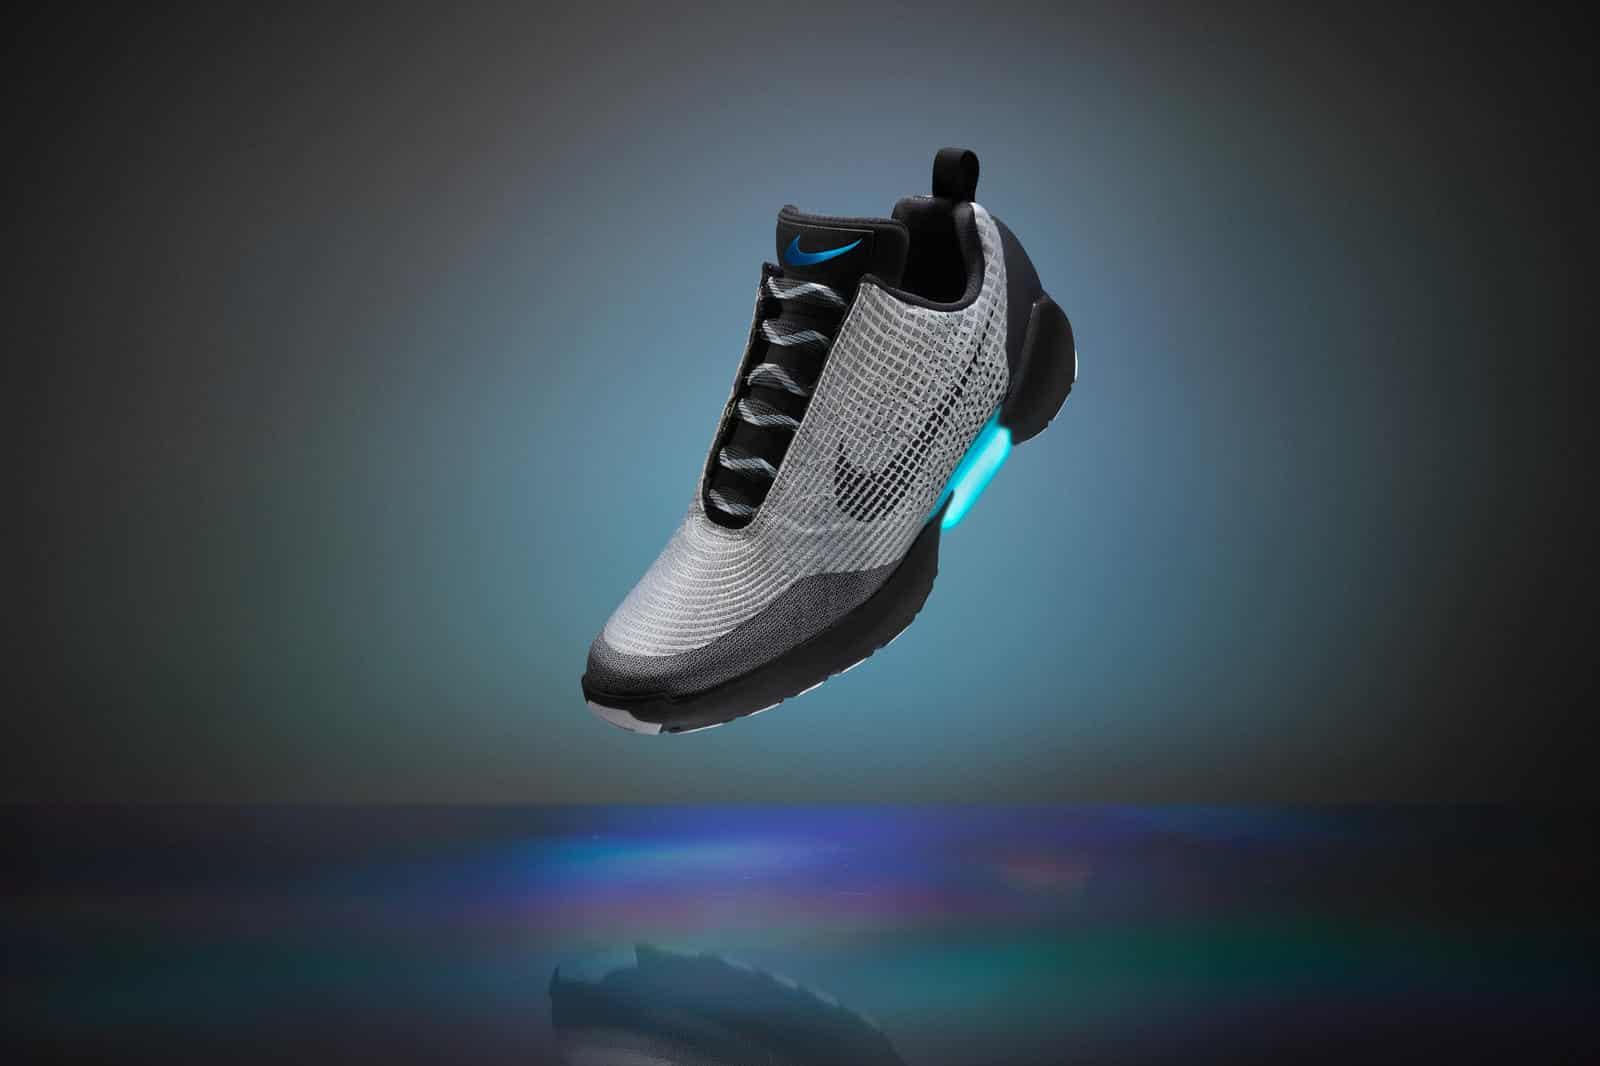 Nike Hyperadapt 1.0 Chile